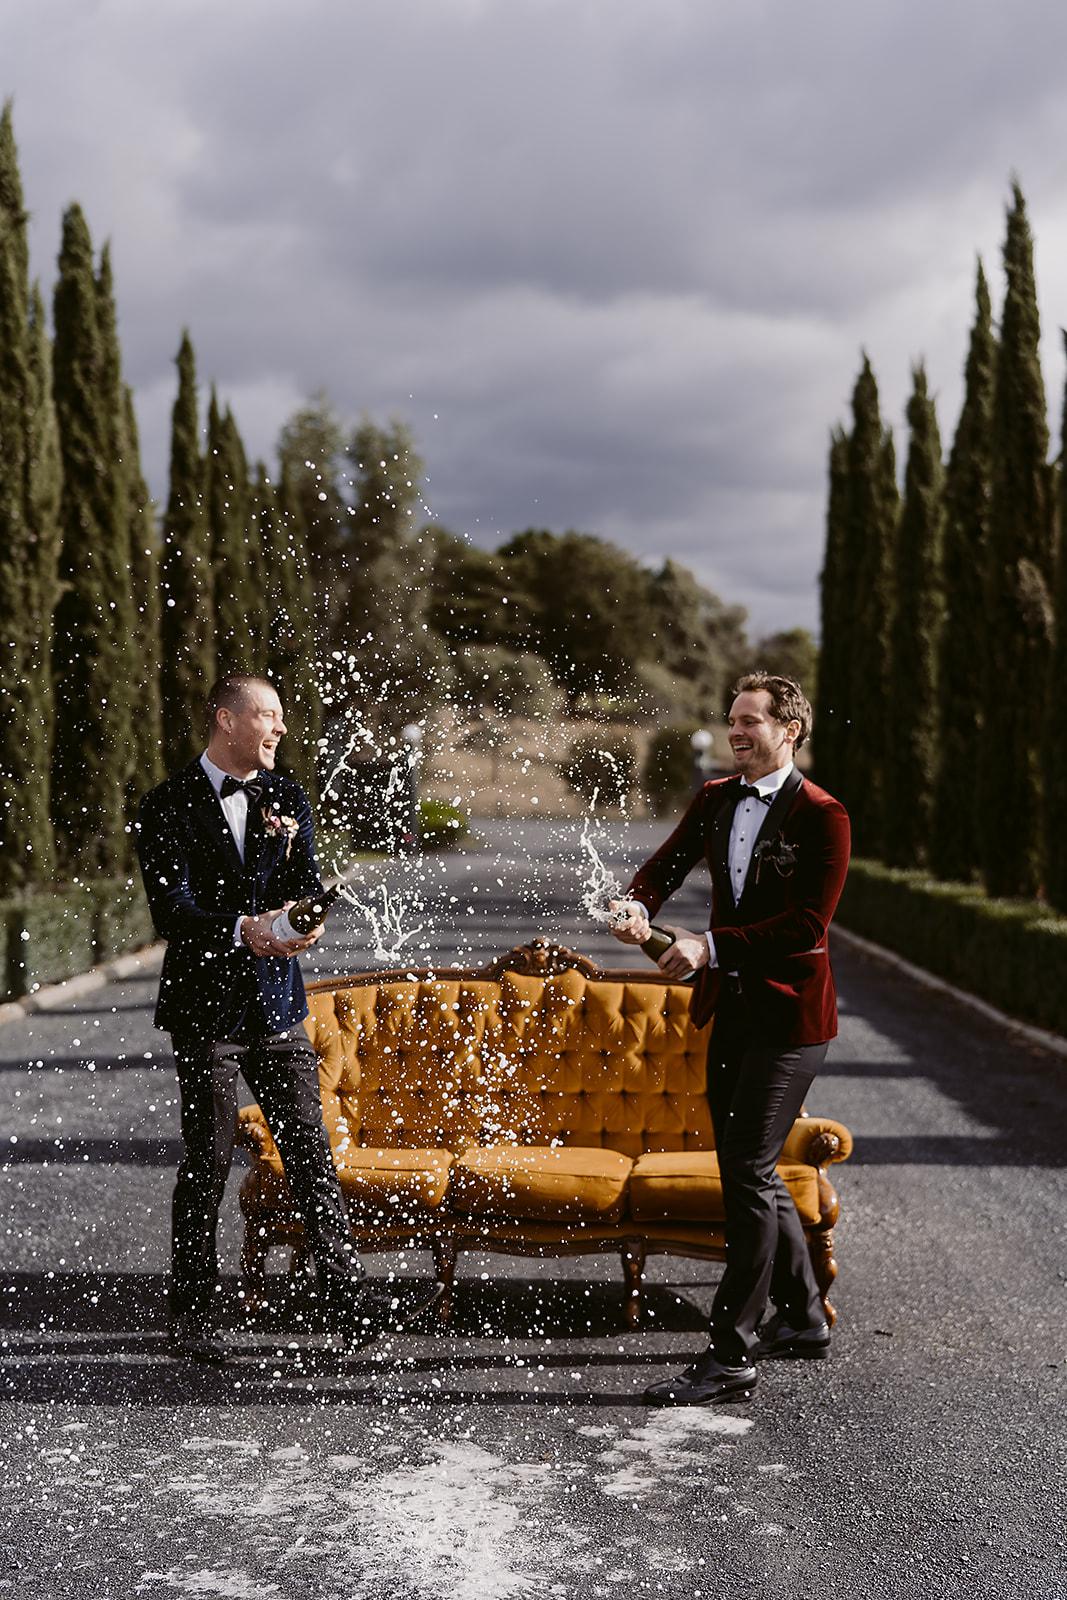 Immerse_Yarra_Valley_Same_Sex_Wedding_-_Ashleigh_Haase_Photography-10.jpg